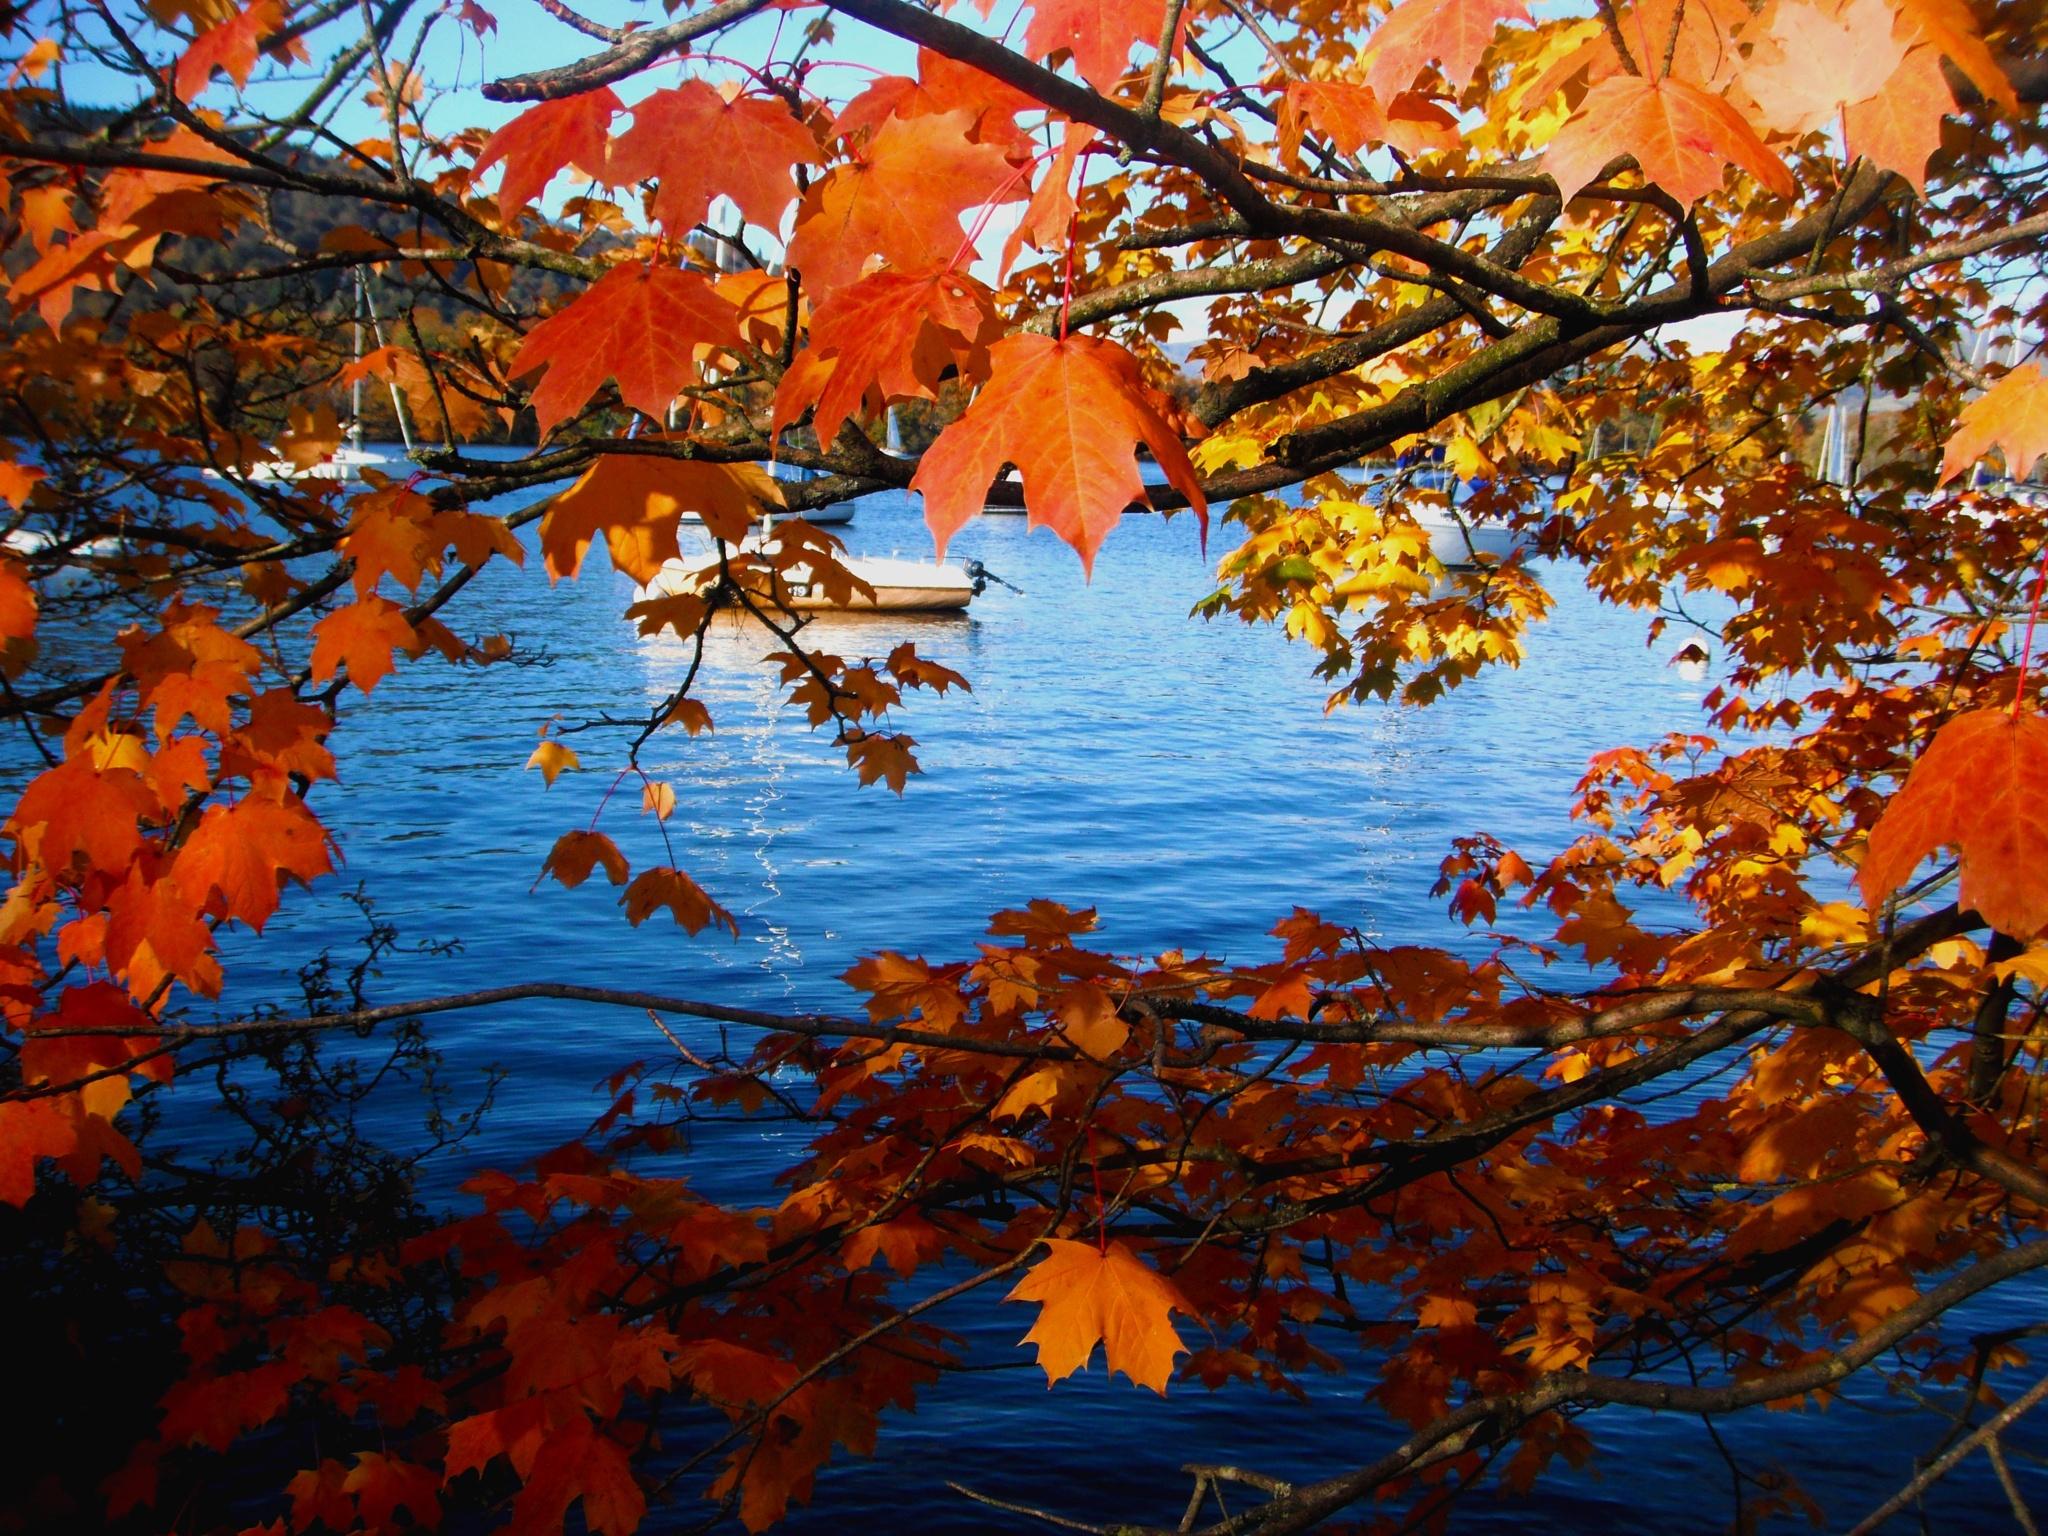 Autumm On The Lake  by Vicky Sally Naughton